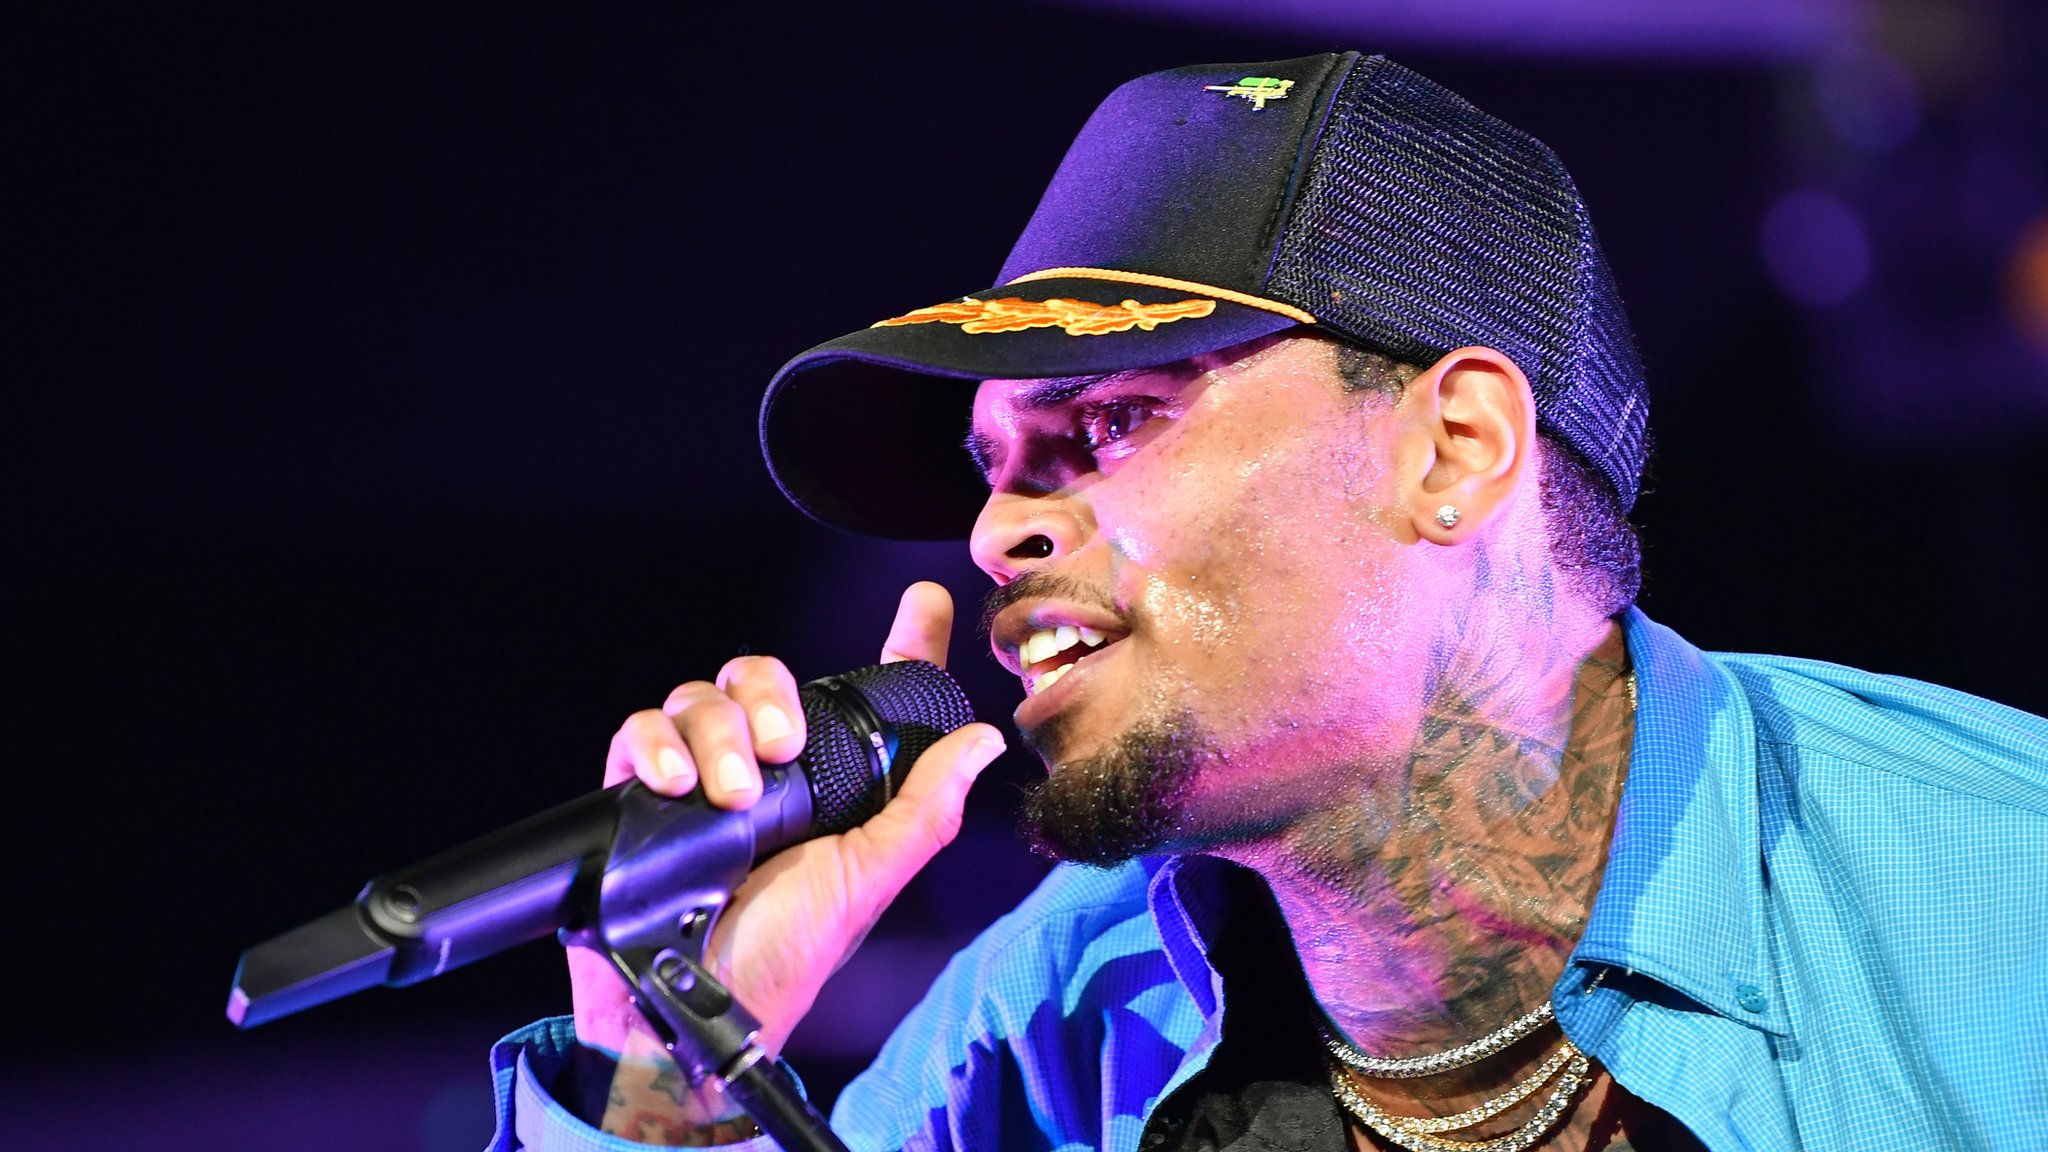 Chris Brown: US singer arrested in Paris on suspicion of rape